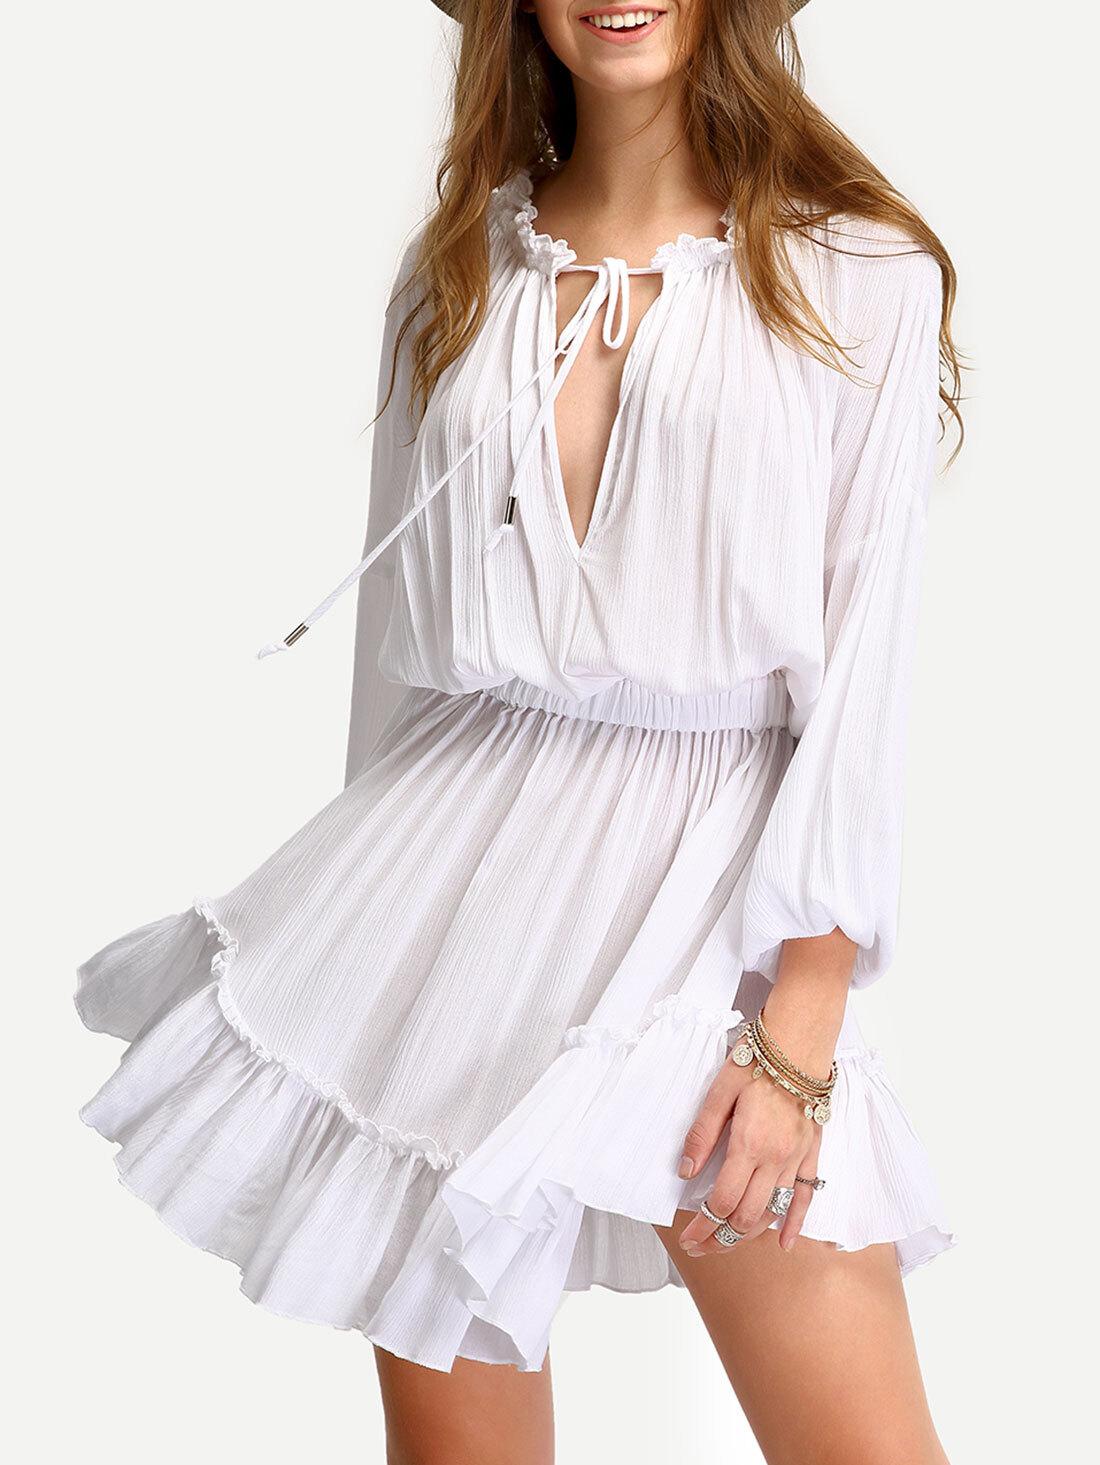 e031ad96bffa White Deep V Neck Lantern Sleeve Ruffle Lace Up Dress